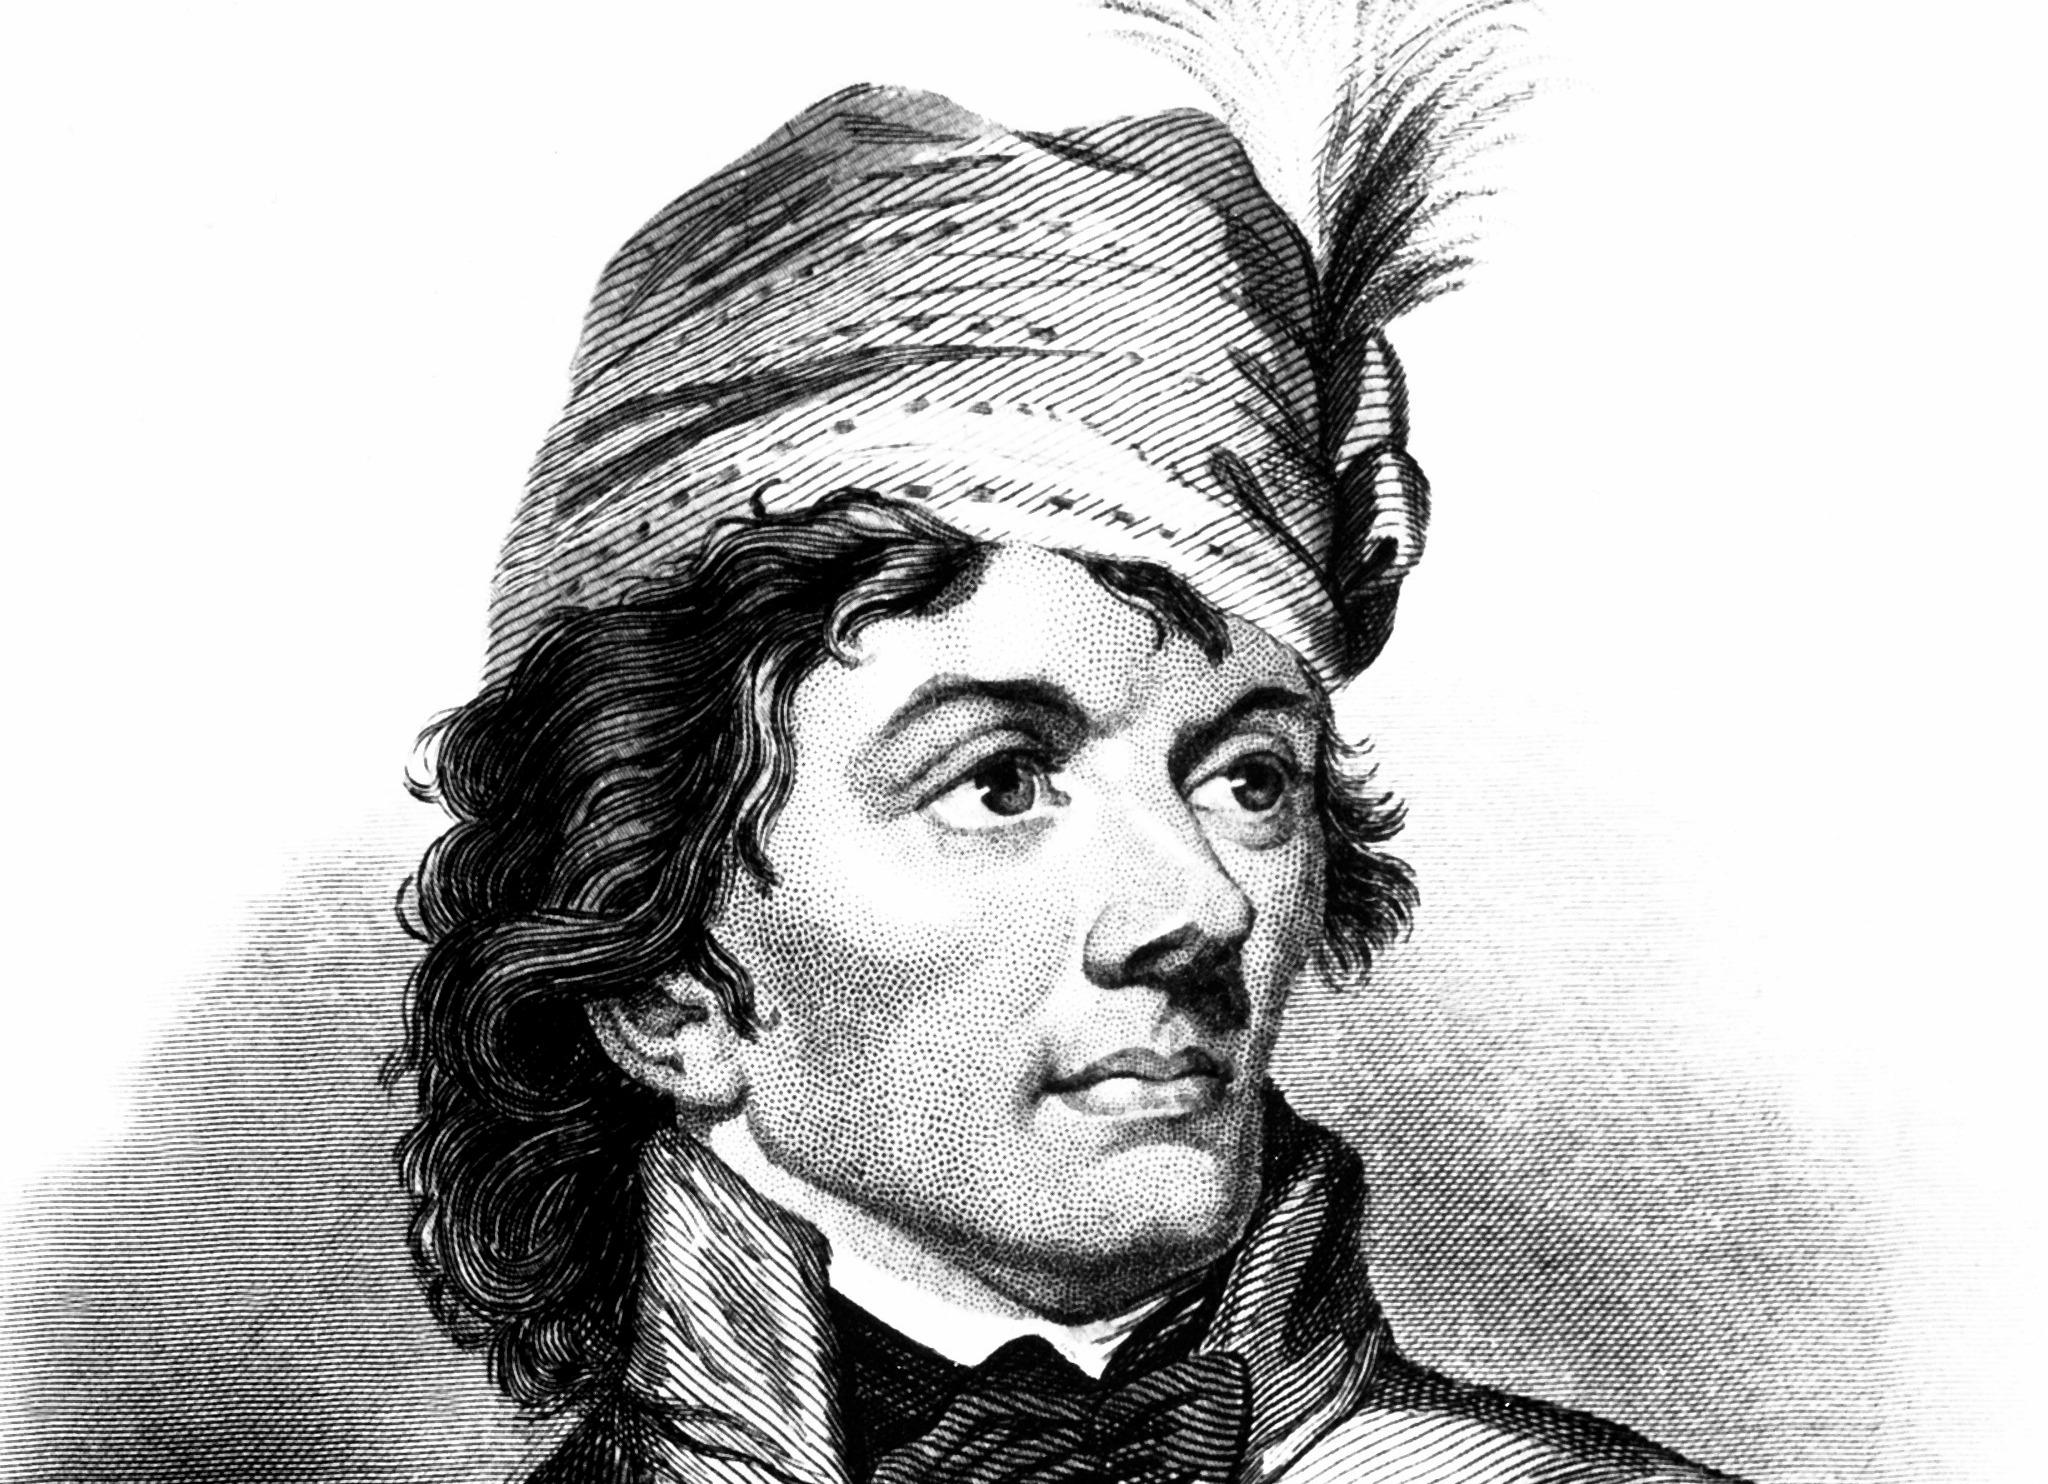 Teseusz kościuszko